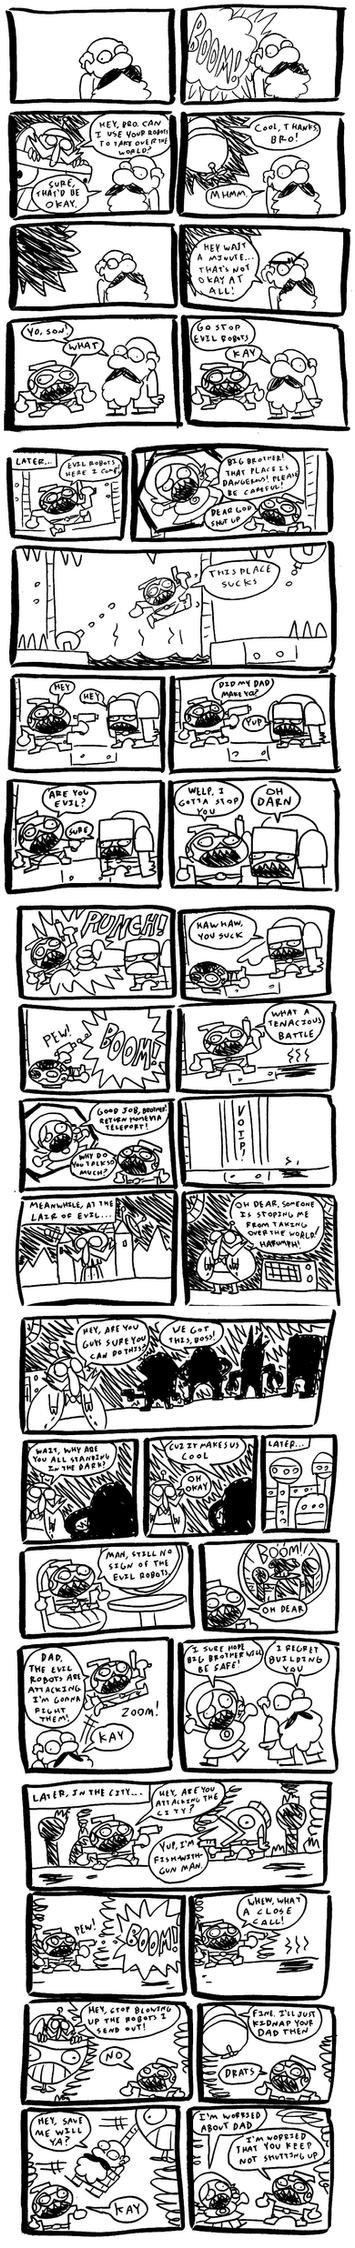 Astro Bastard Pages 1 - 5 by MichaelJLarson